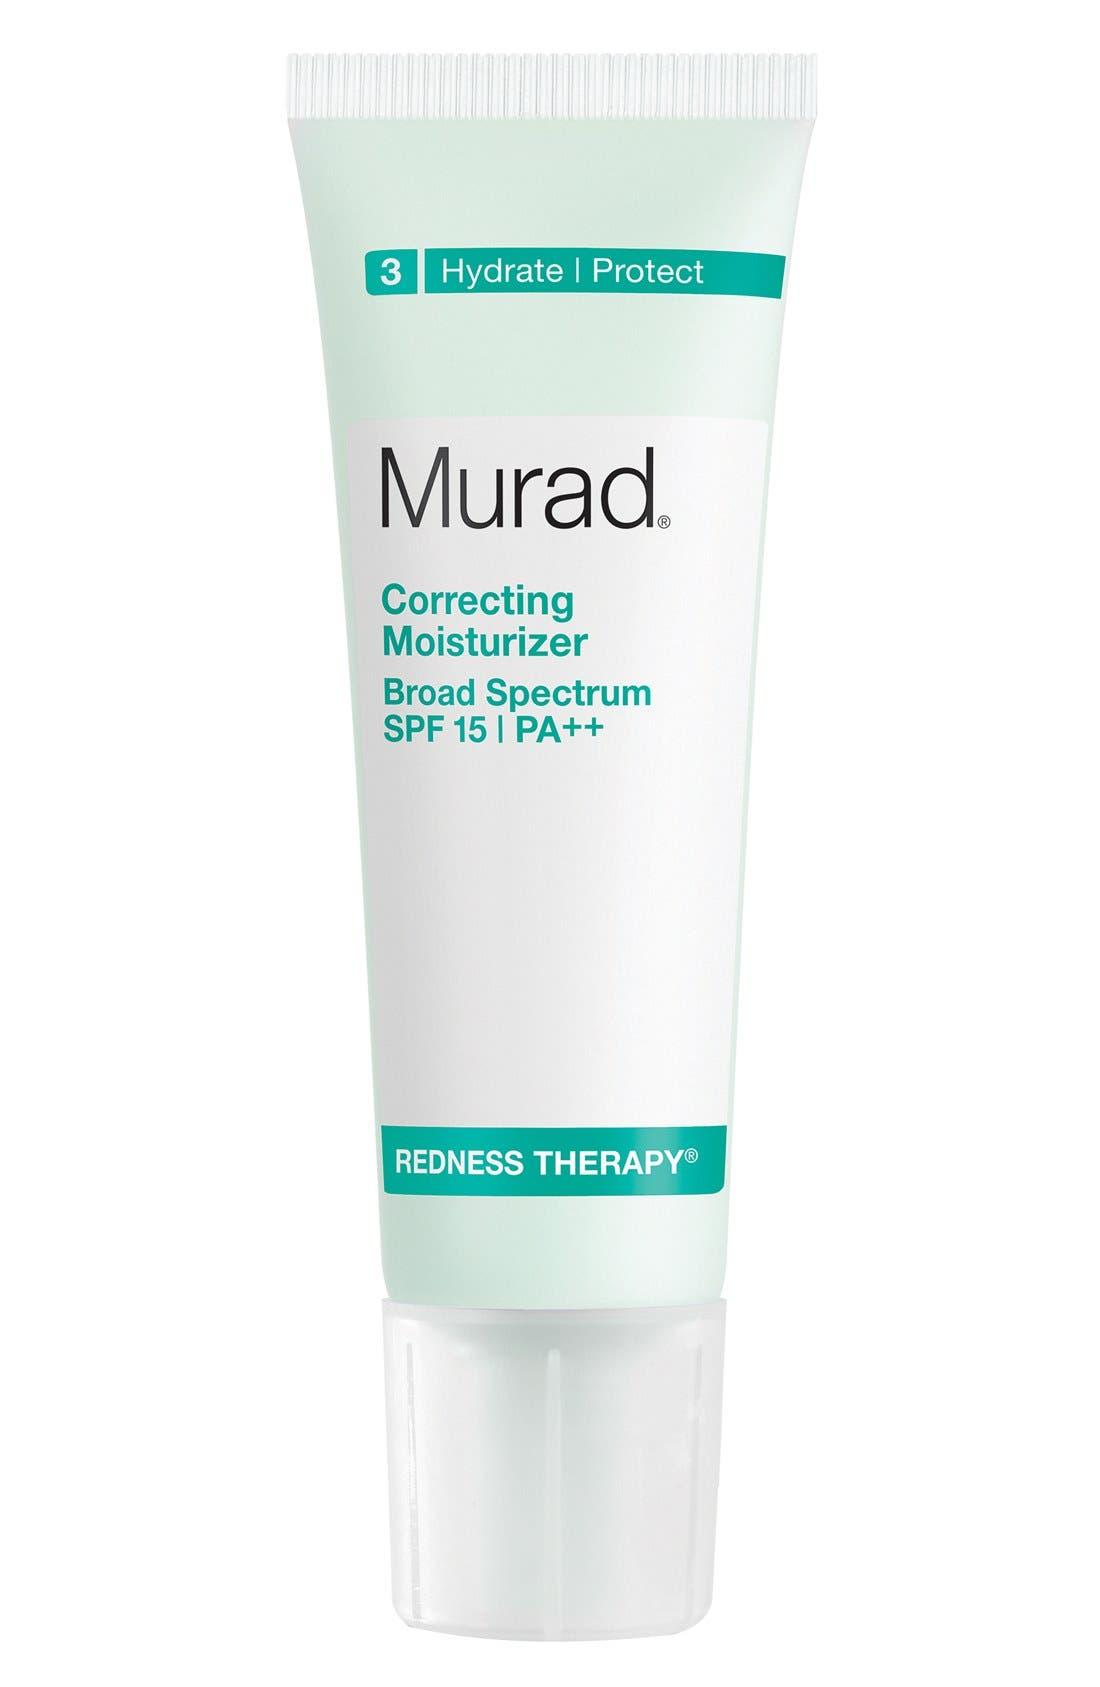 Murad® Correcting Moisturizer Broad Spectrum SPF 15 PA++